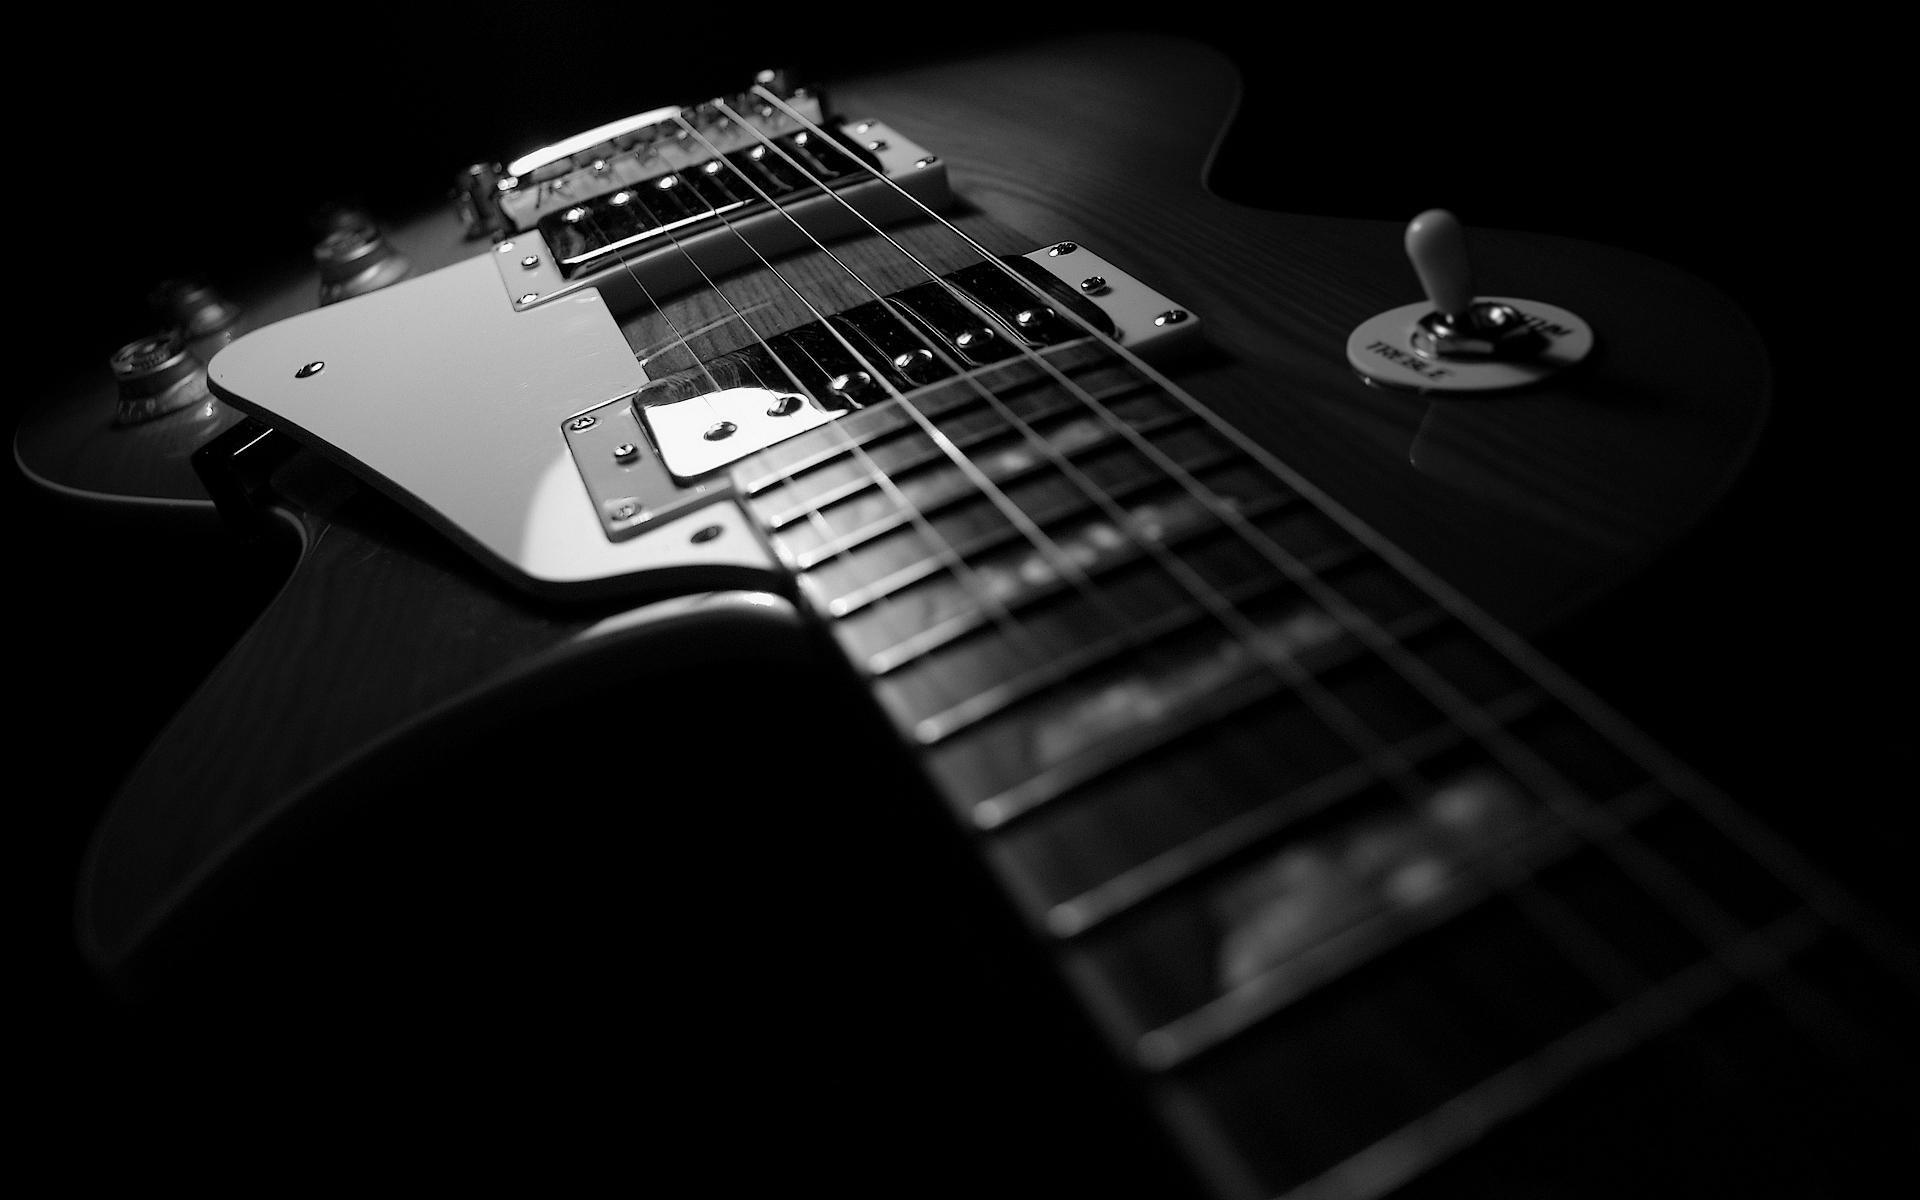 Guitar Wallpaper For Desktop